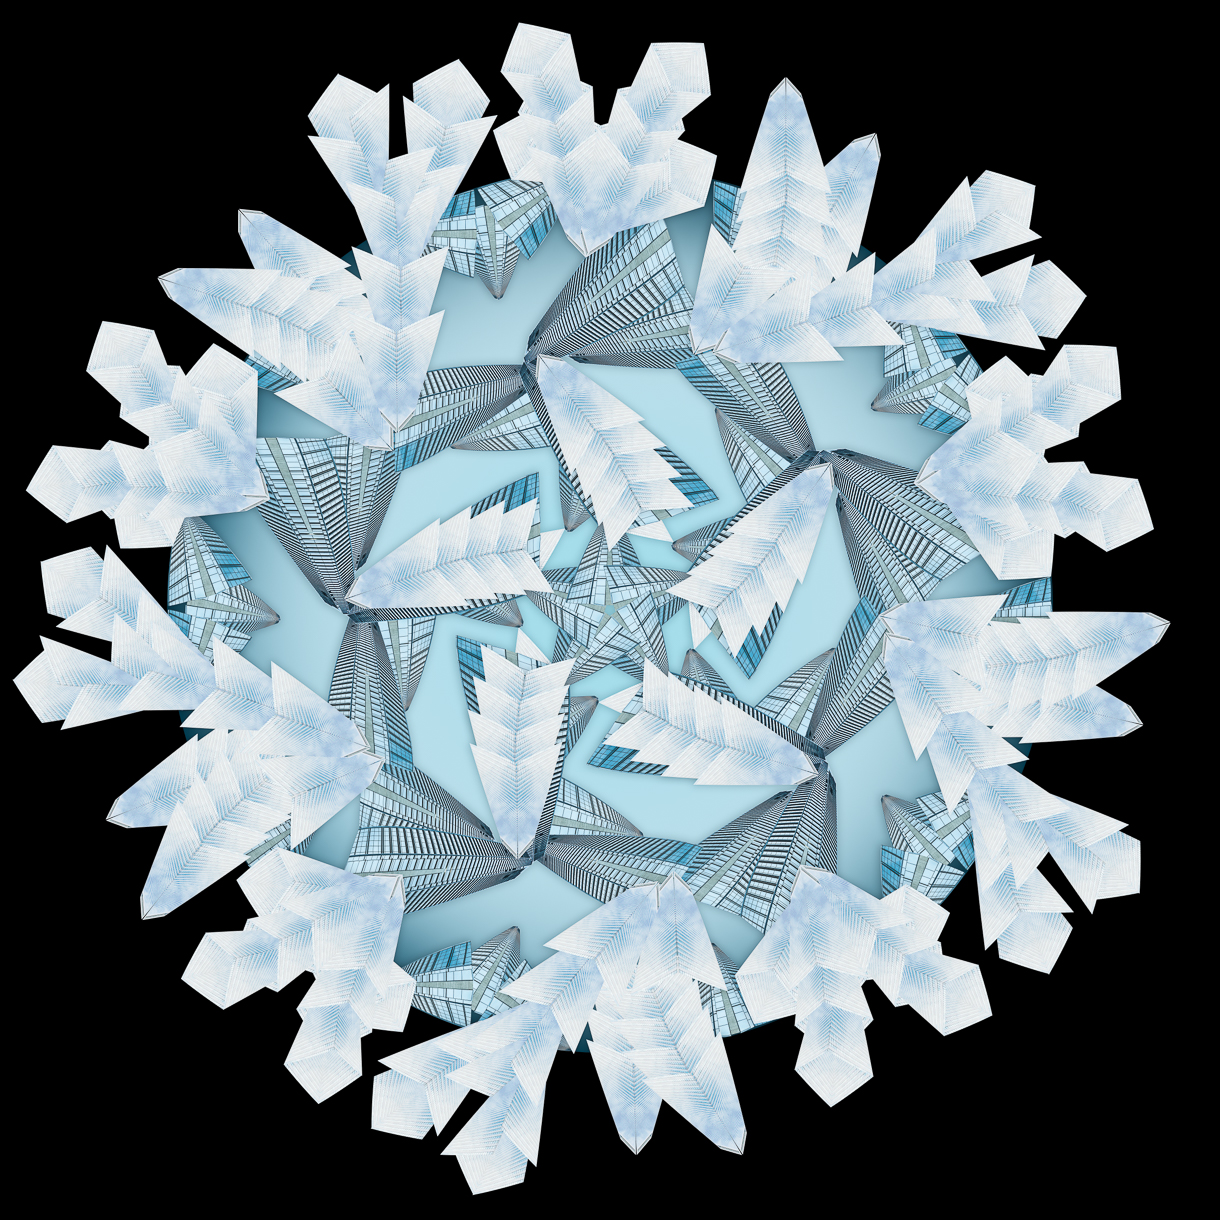 Poliovirus type 2 42in_final.jpg